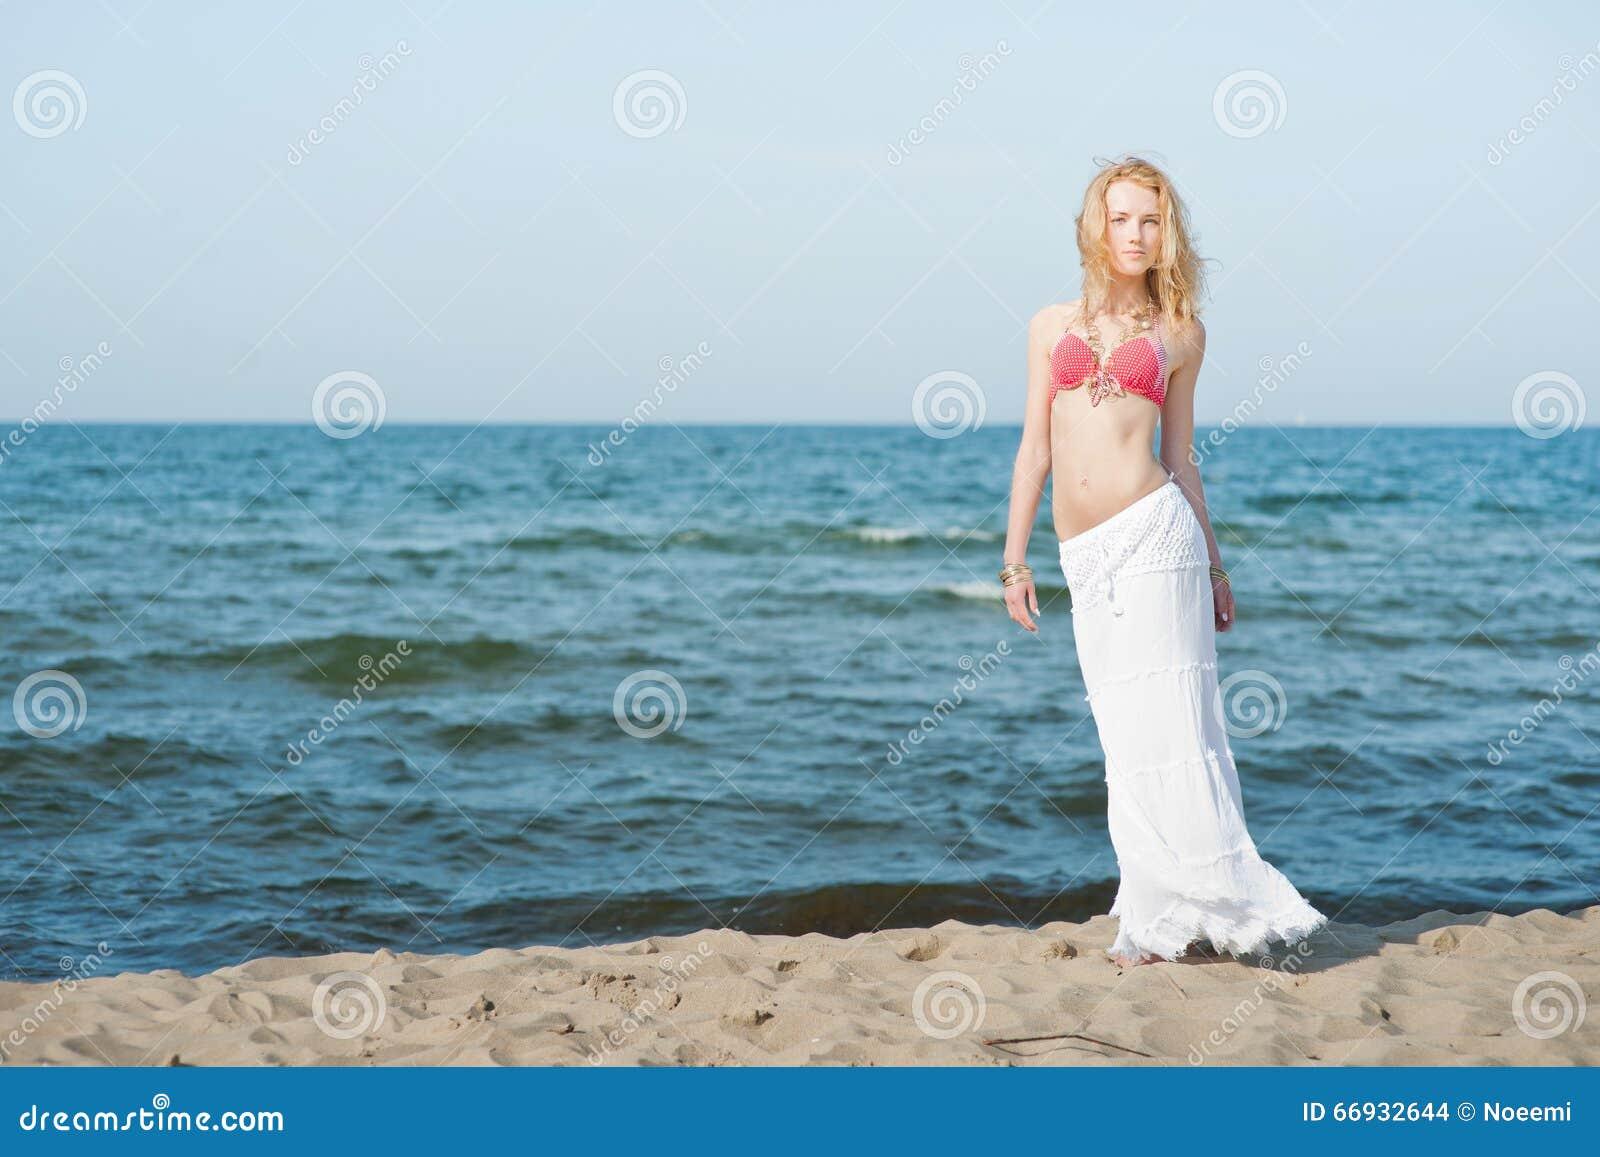 Beautiful young blond woman walking on a beach